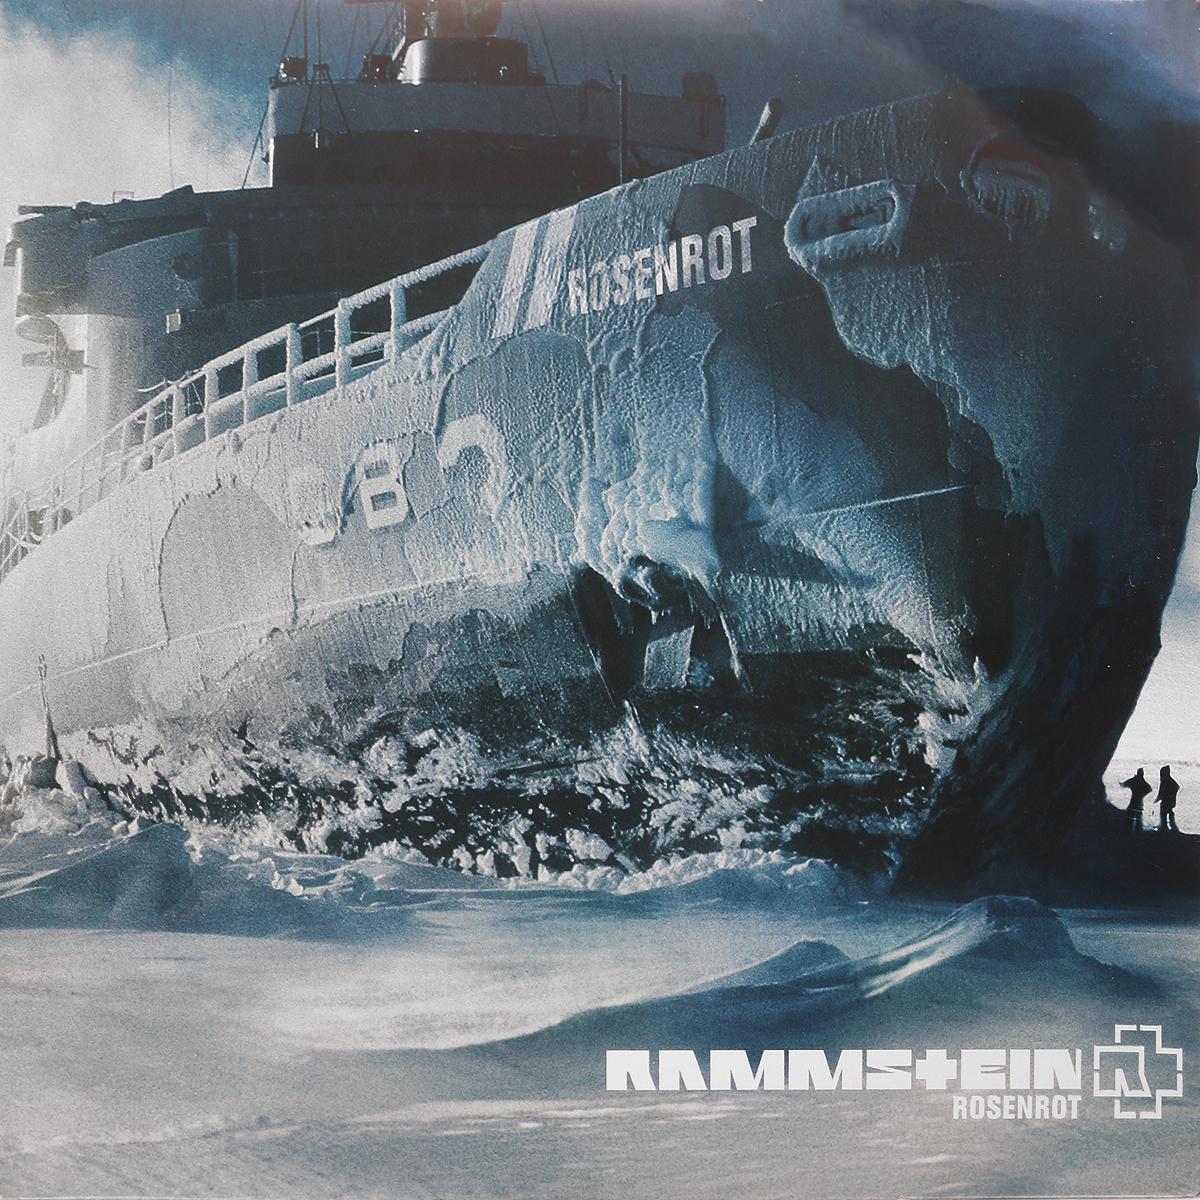 цена на Rammstein Rammstein. Rosenrot (2 LP)